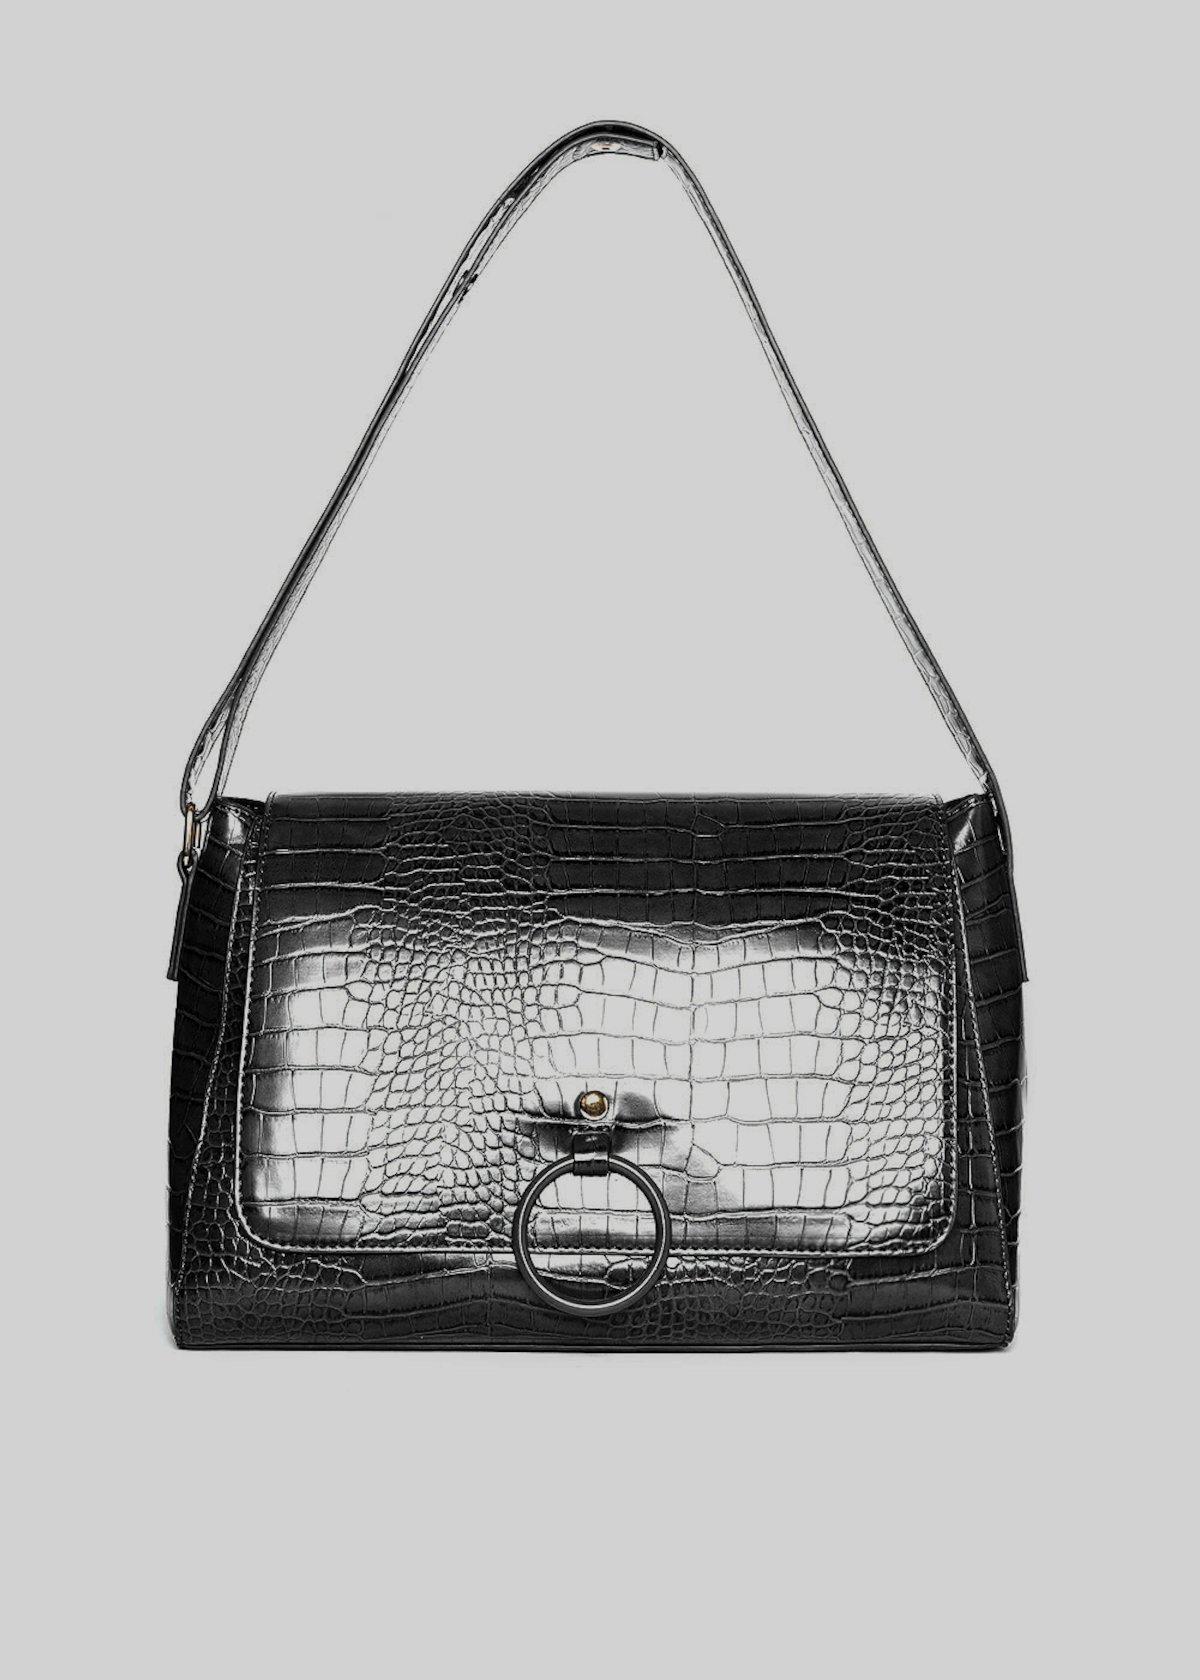 Boralia C faux leather shoulder bag with coconut effect